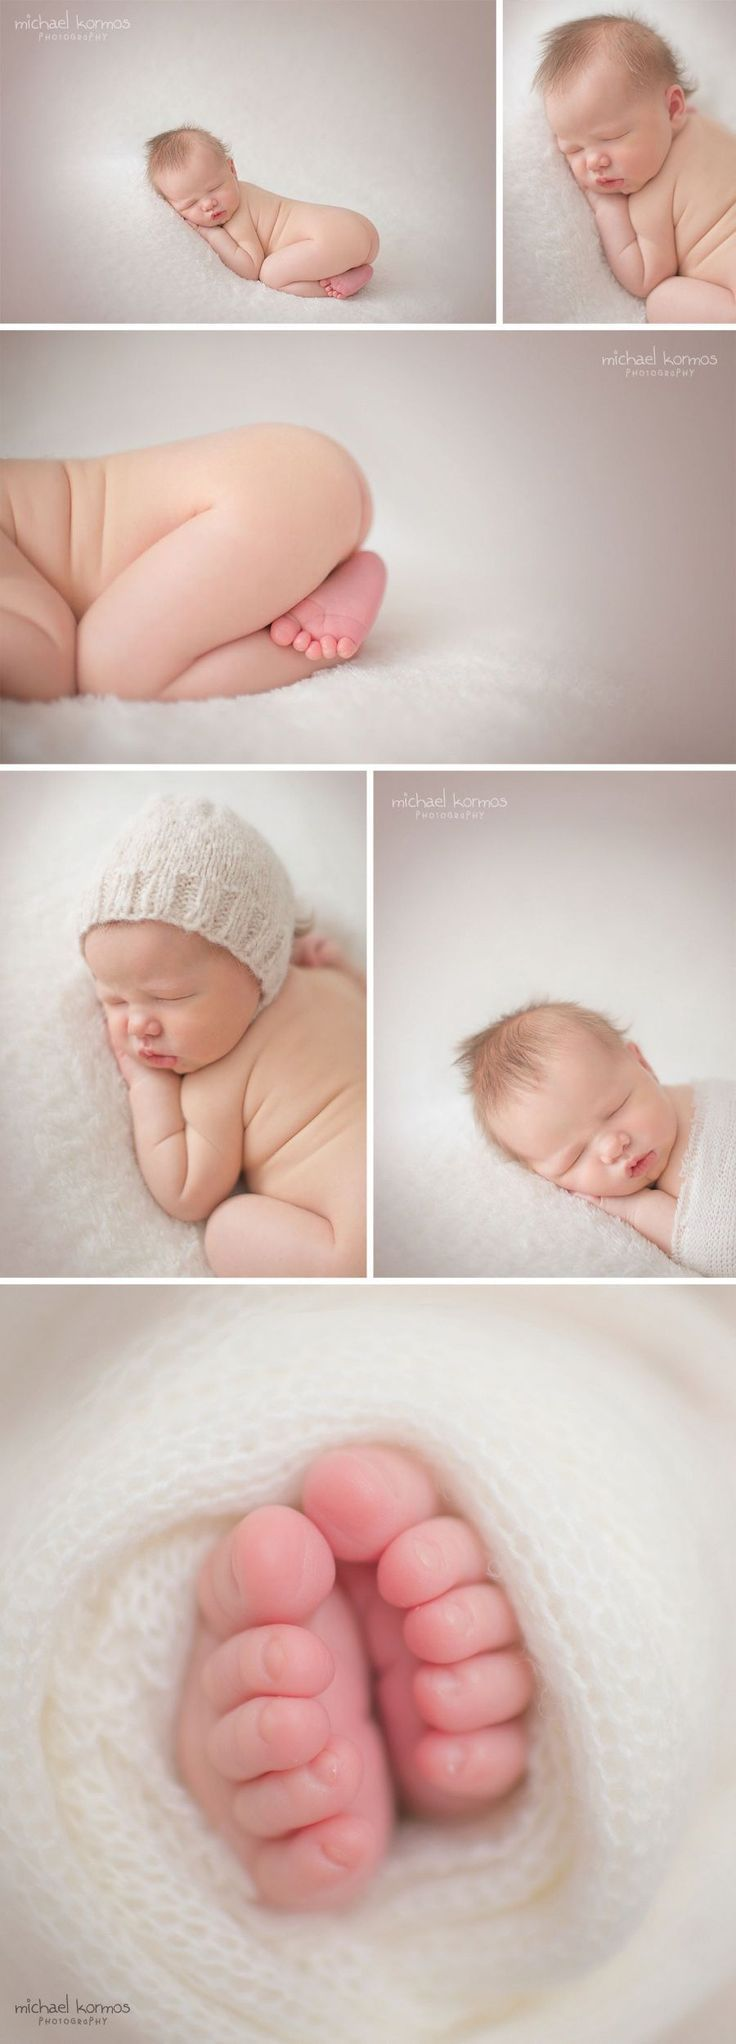 Artistic lifestyle newborn photography captured comfortably in manhattn home baby ideas pinterest photo bébé bébé et grossesse